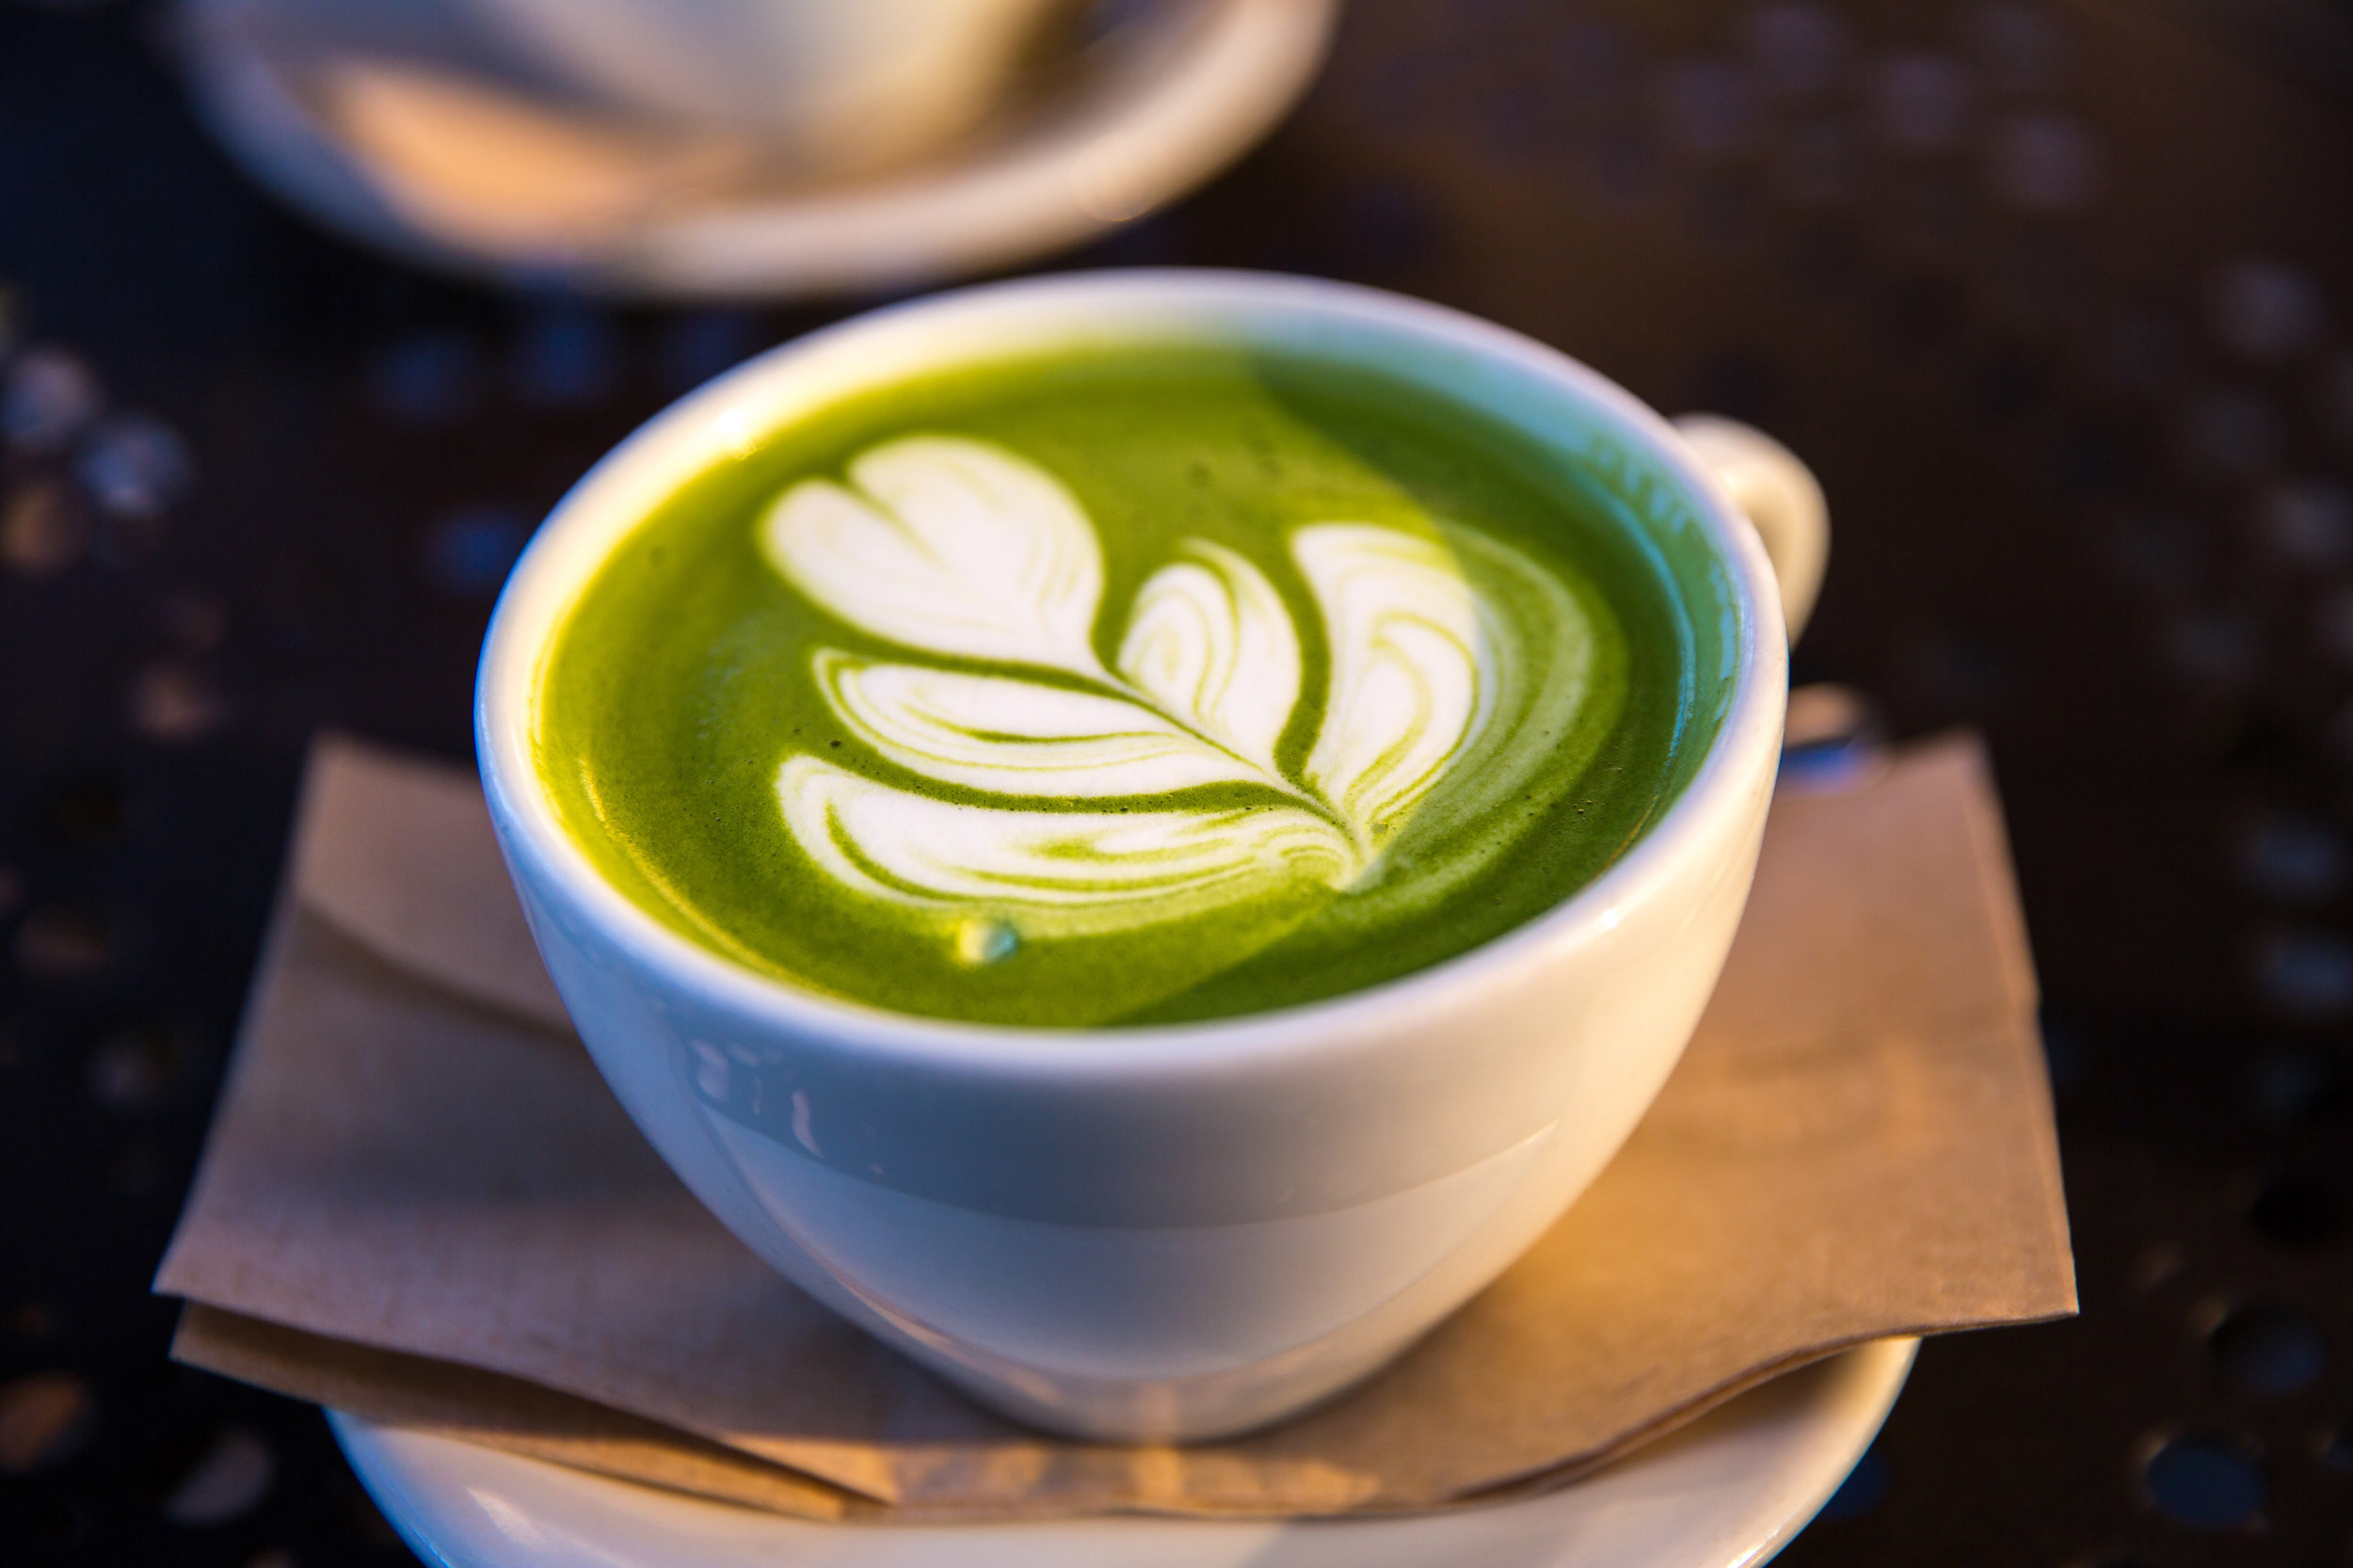 Matcha Green Tea Latte - www.JoyfulGoodness.com - #JoyfulGoodness #beJoyful #matcha #stpatricksday #breakfast #latte